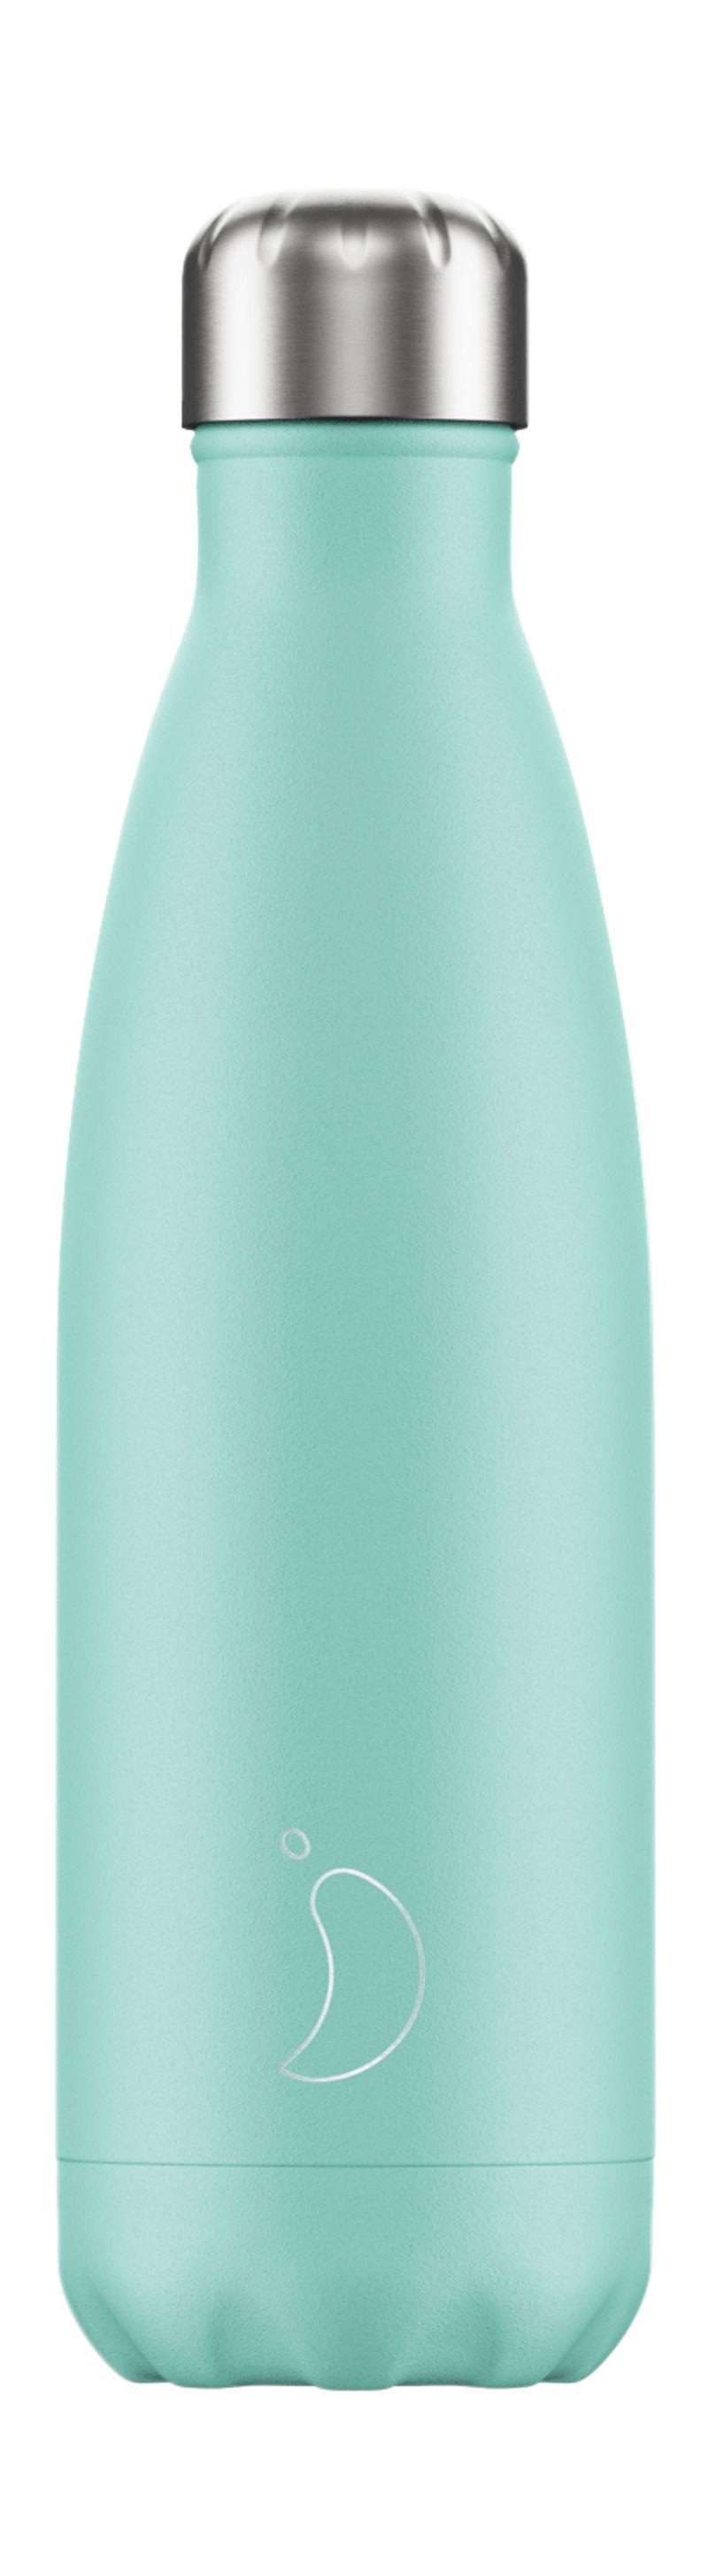 Botella Inox Menta Pastel 500ml -